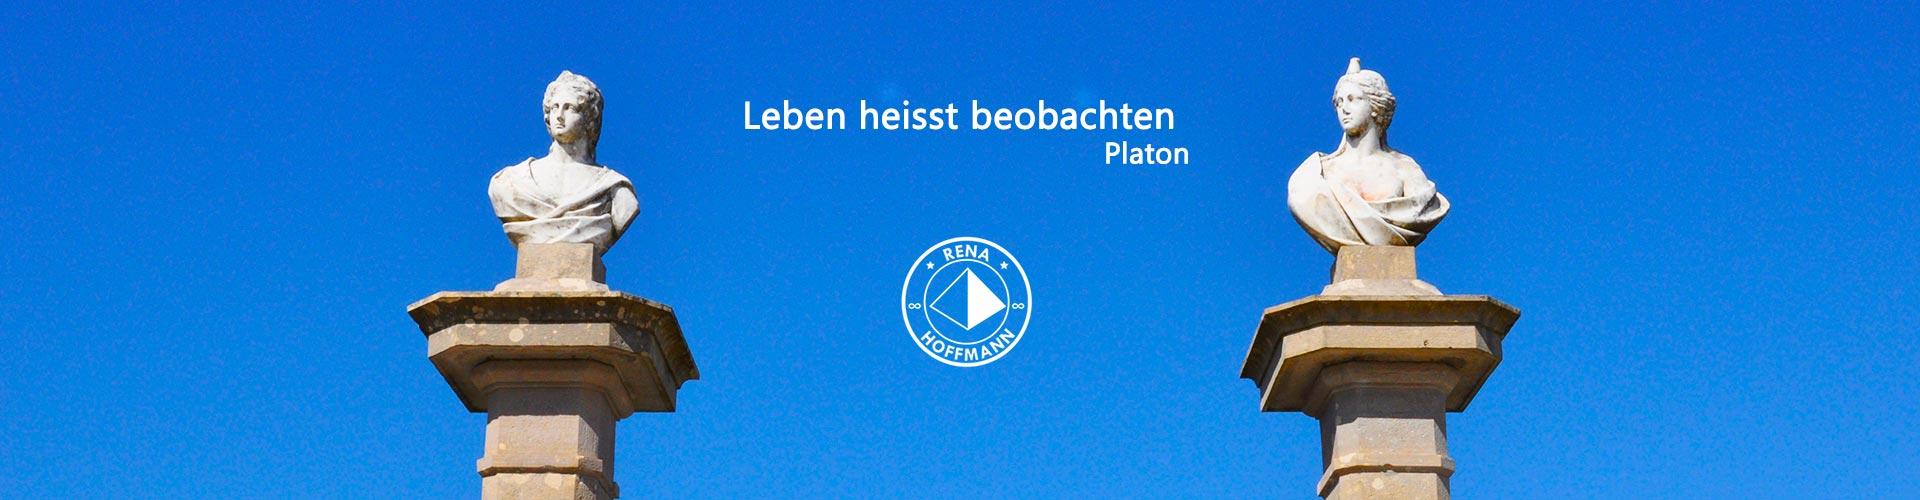 Vita-platon-foto-rena-hoffmann.jpg